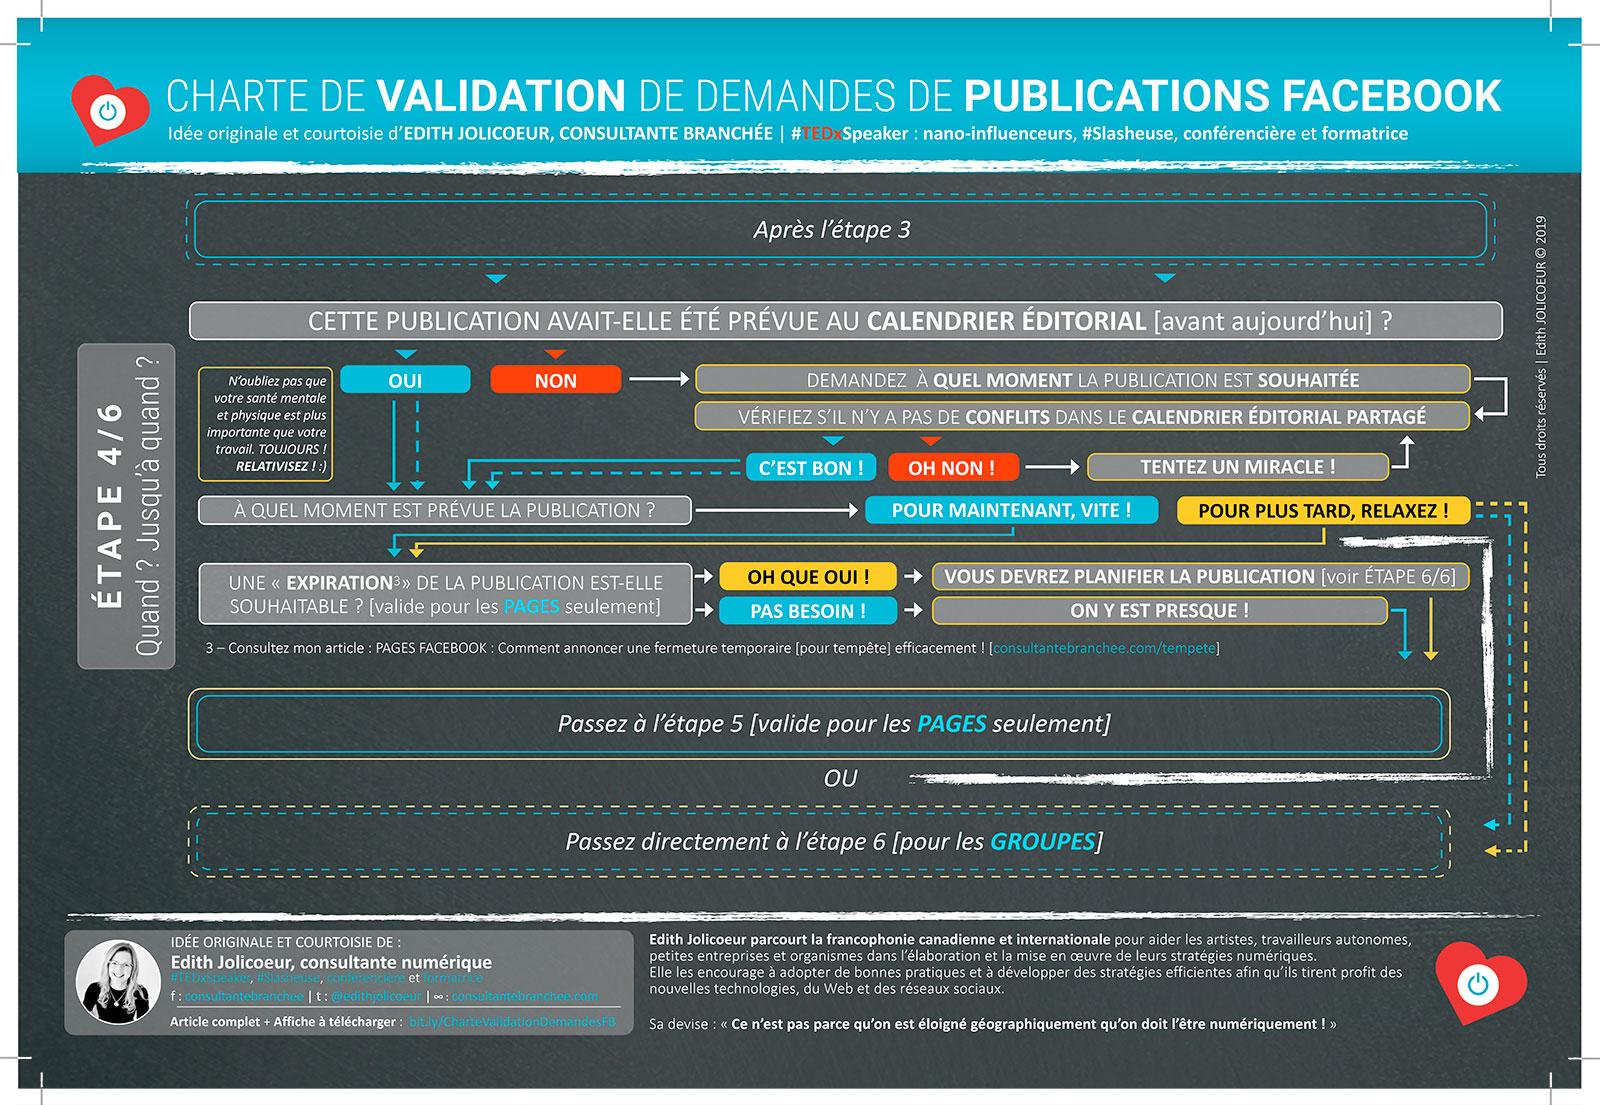 Étape 4 : CHARTE DE VALIDATION de demandes de publications Facebook | Edith JOLICOEUR, consultante branchée